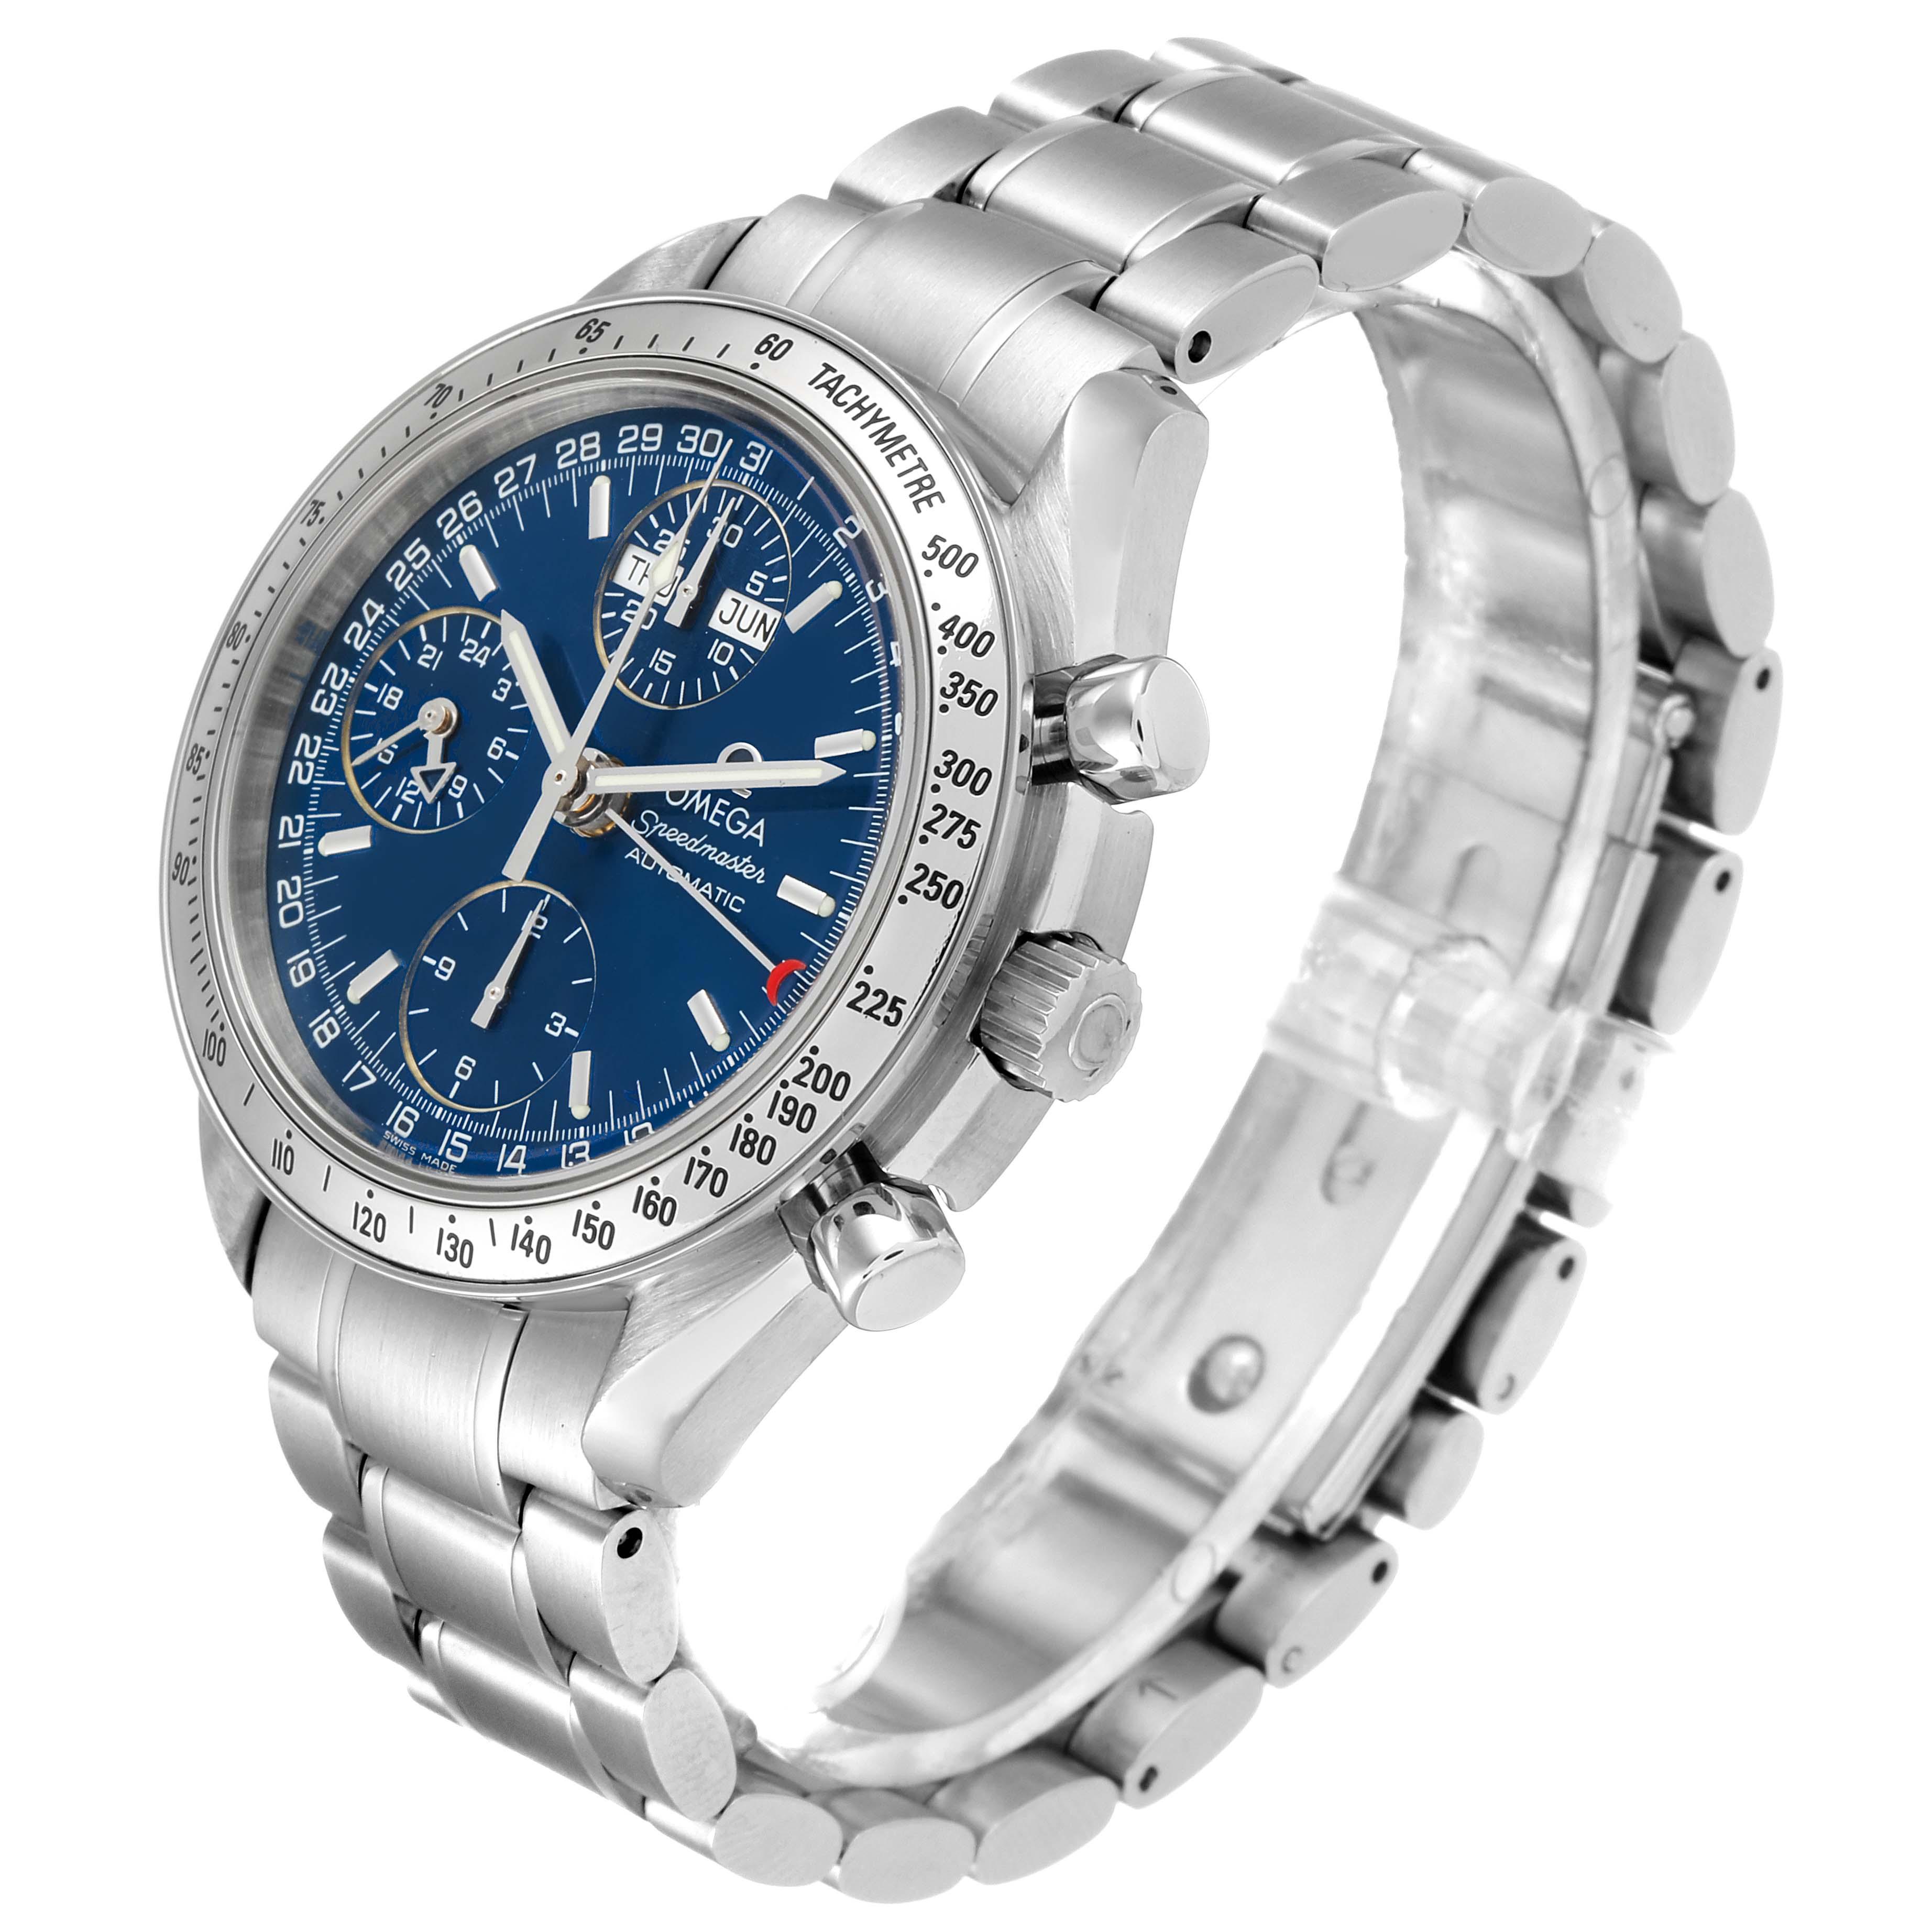 Omega Speedmaster Day-Date Blue Dial Steel Mens Watch 3523.80.00 Card SwissWatchExpo